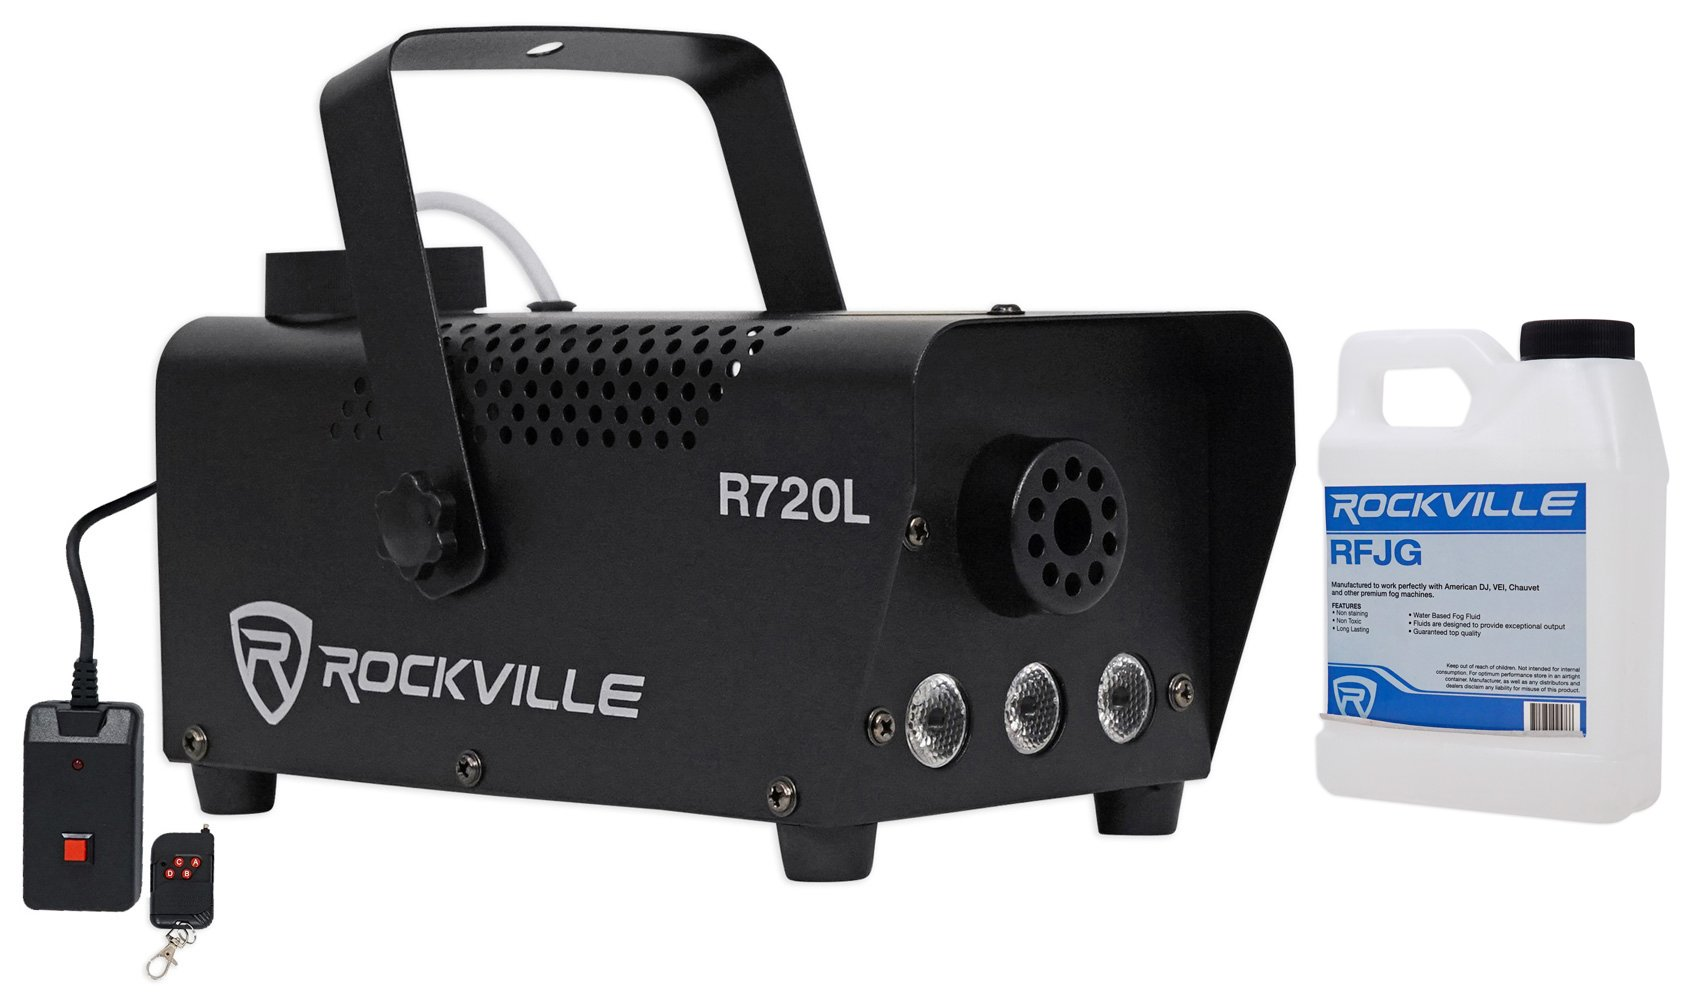 Rockville R720L Fog/Smoke Machine+Remote+Multi Color LED Built In!+Gallon Fluid